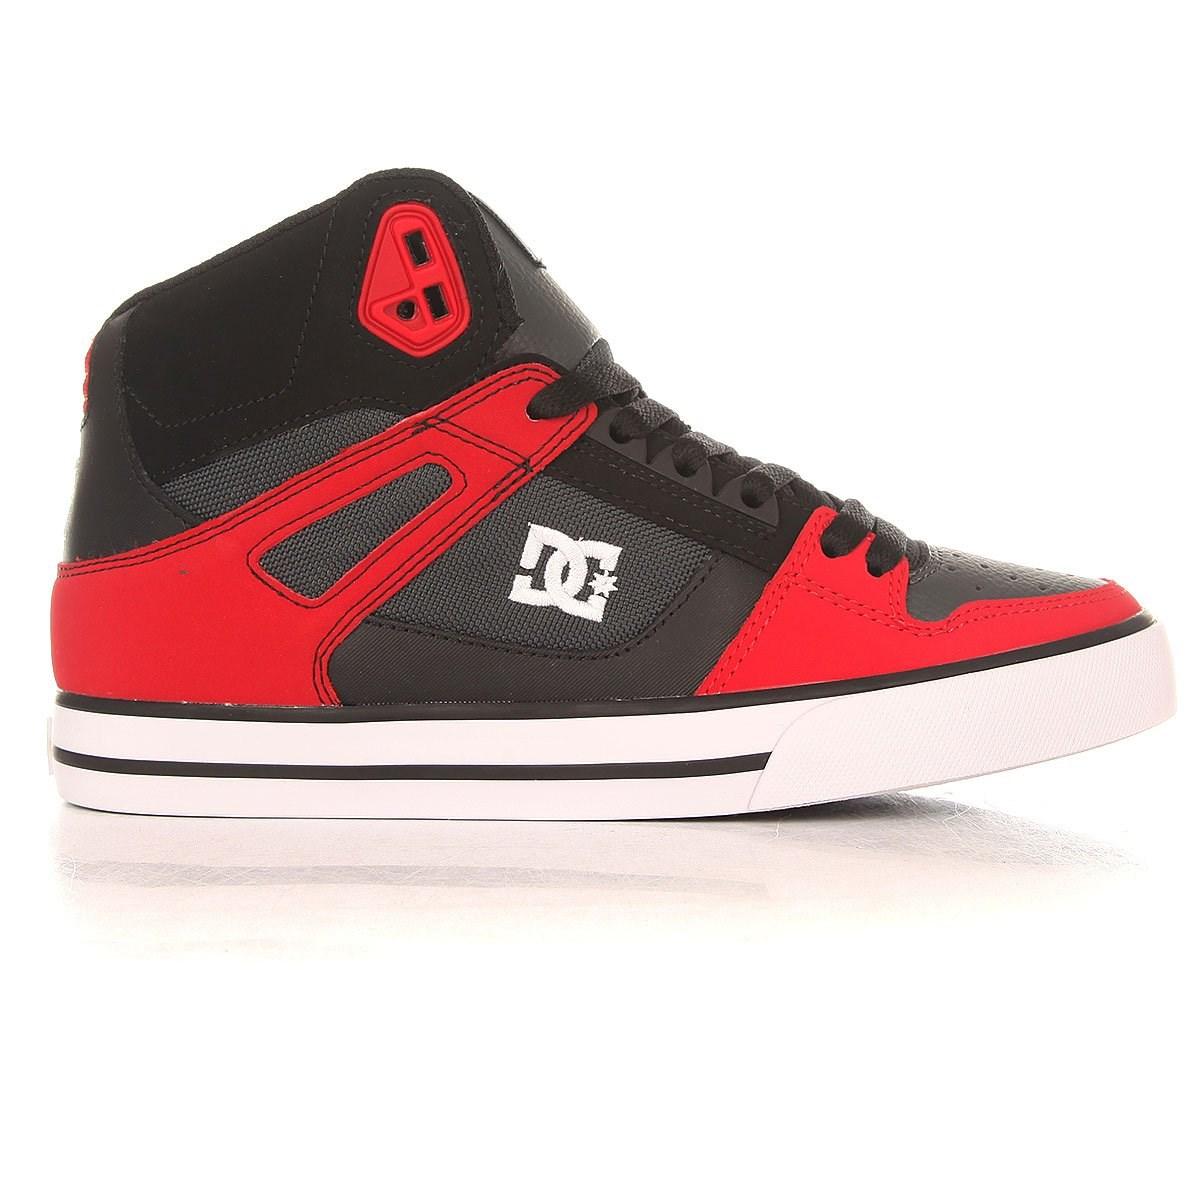 Обувь DC Spartan red grey black